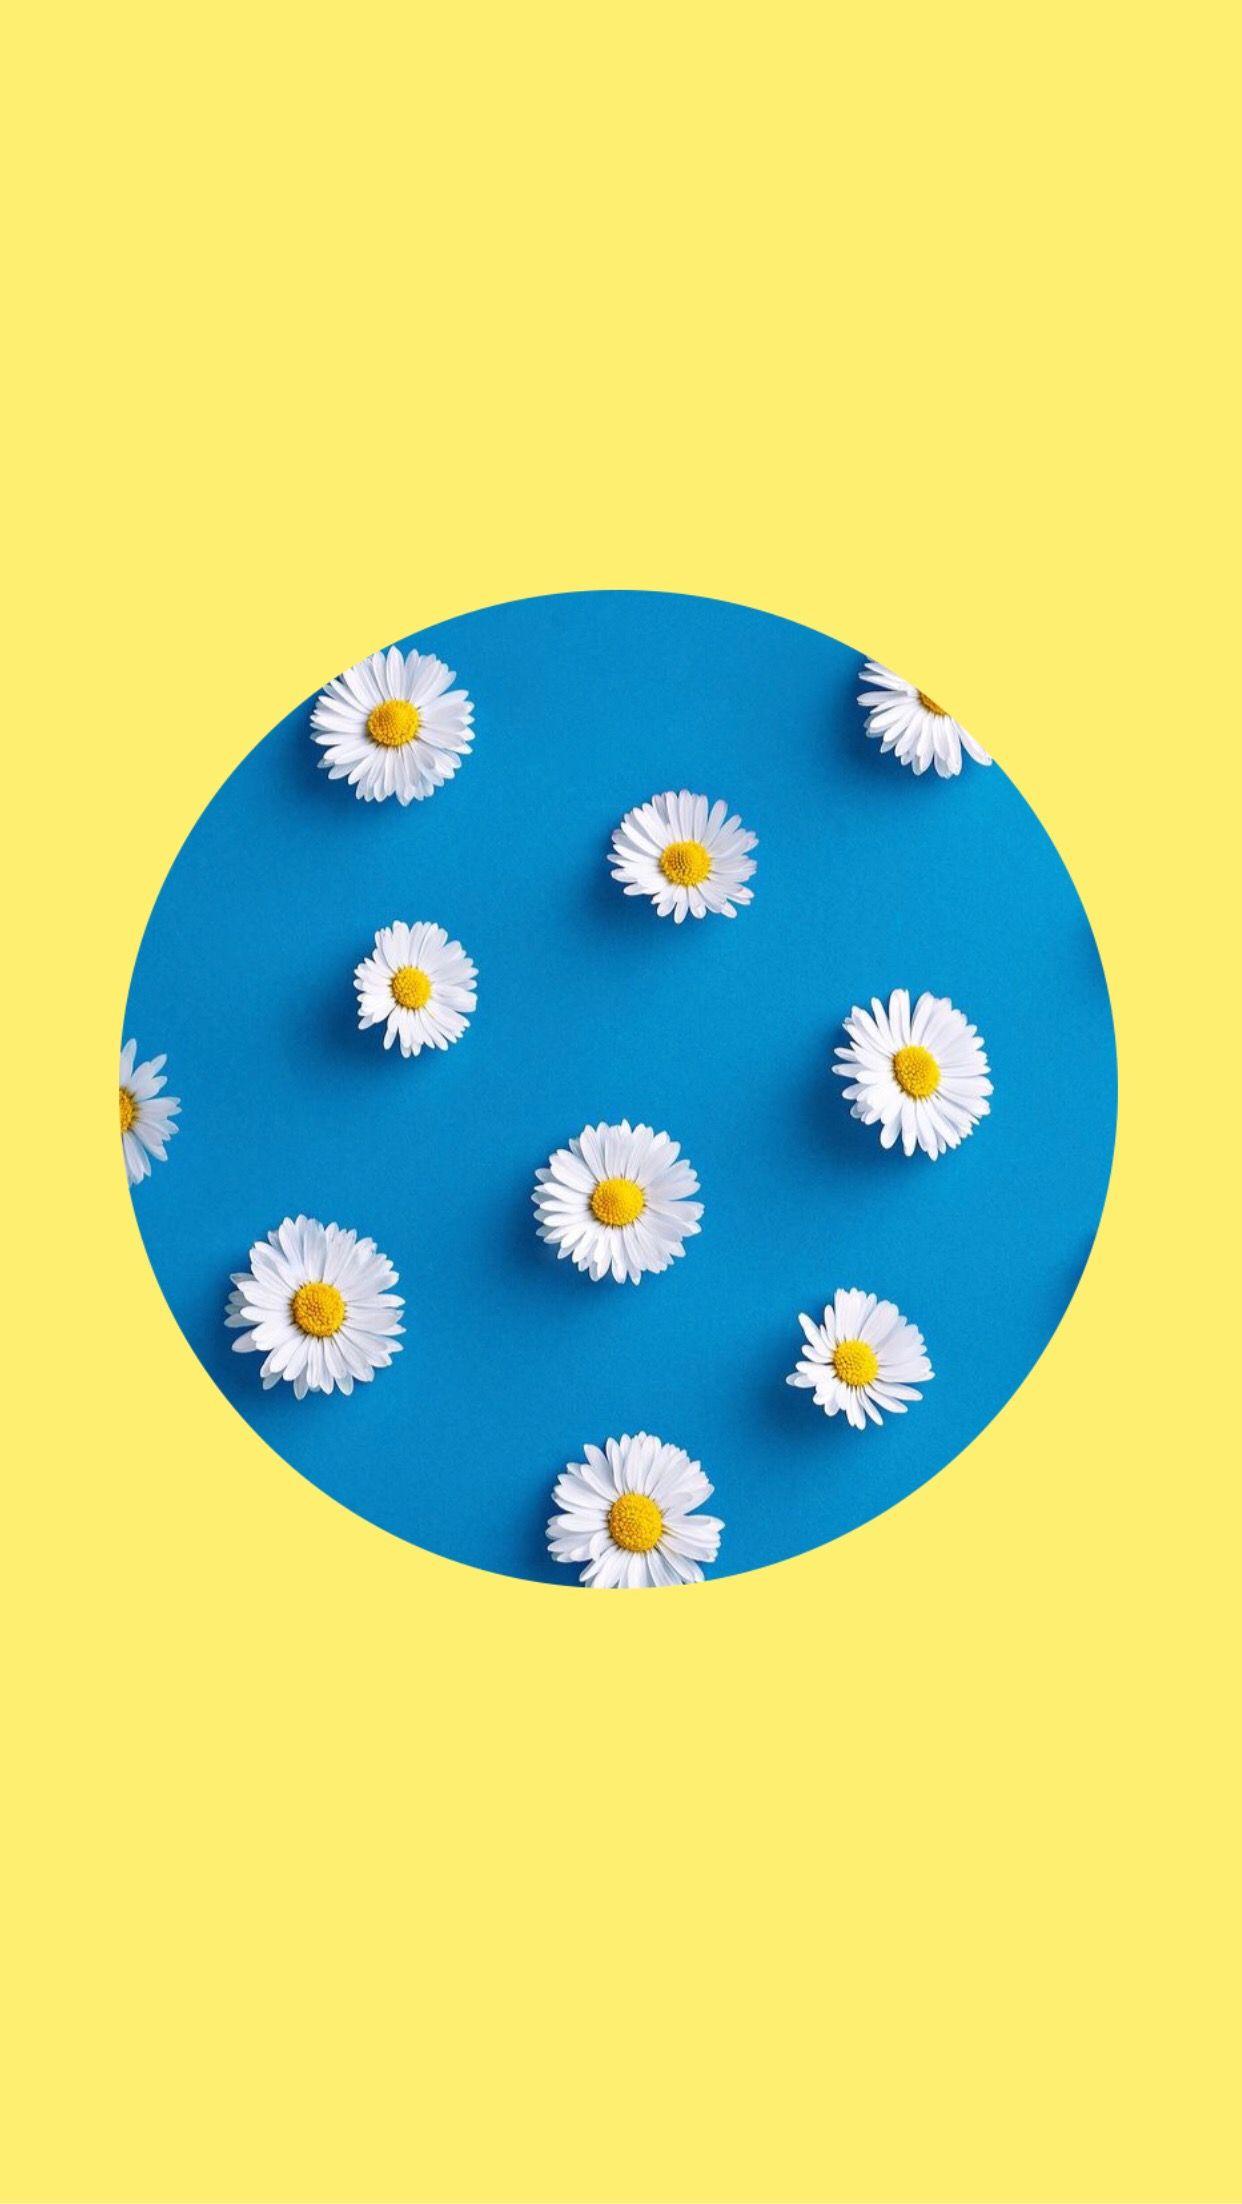 Yellow Lockscreen Wallpaper Background Blue Flowers White Circle Aesthetic Blue Flowers Wallpaper Backgrounds Yellow Aesthetic Pastel